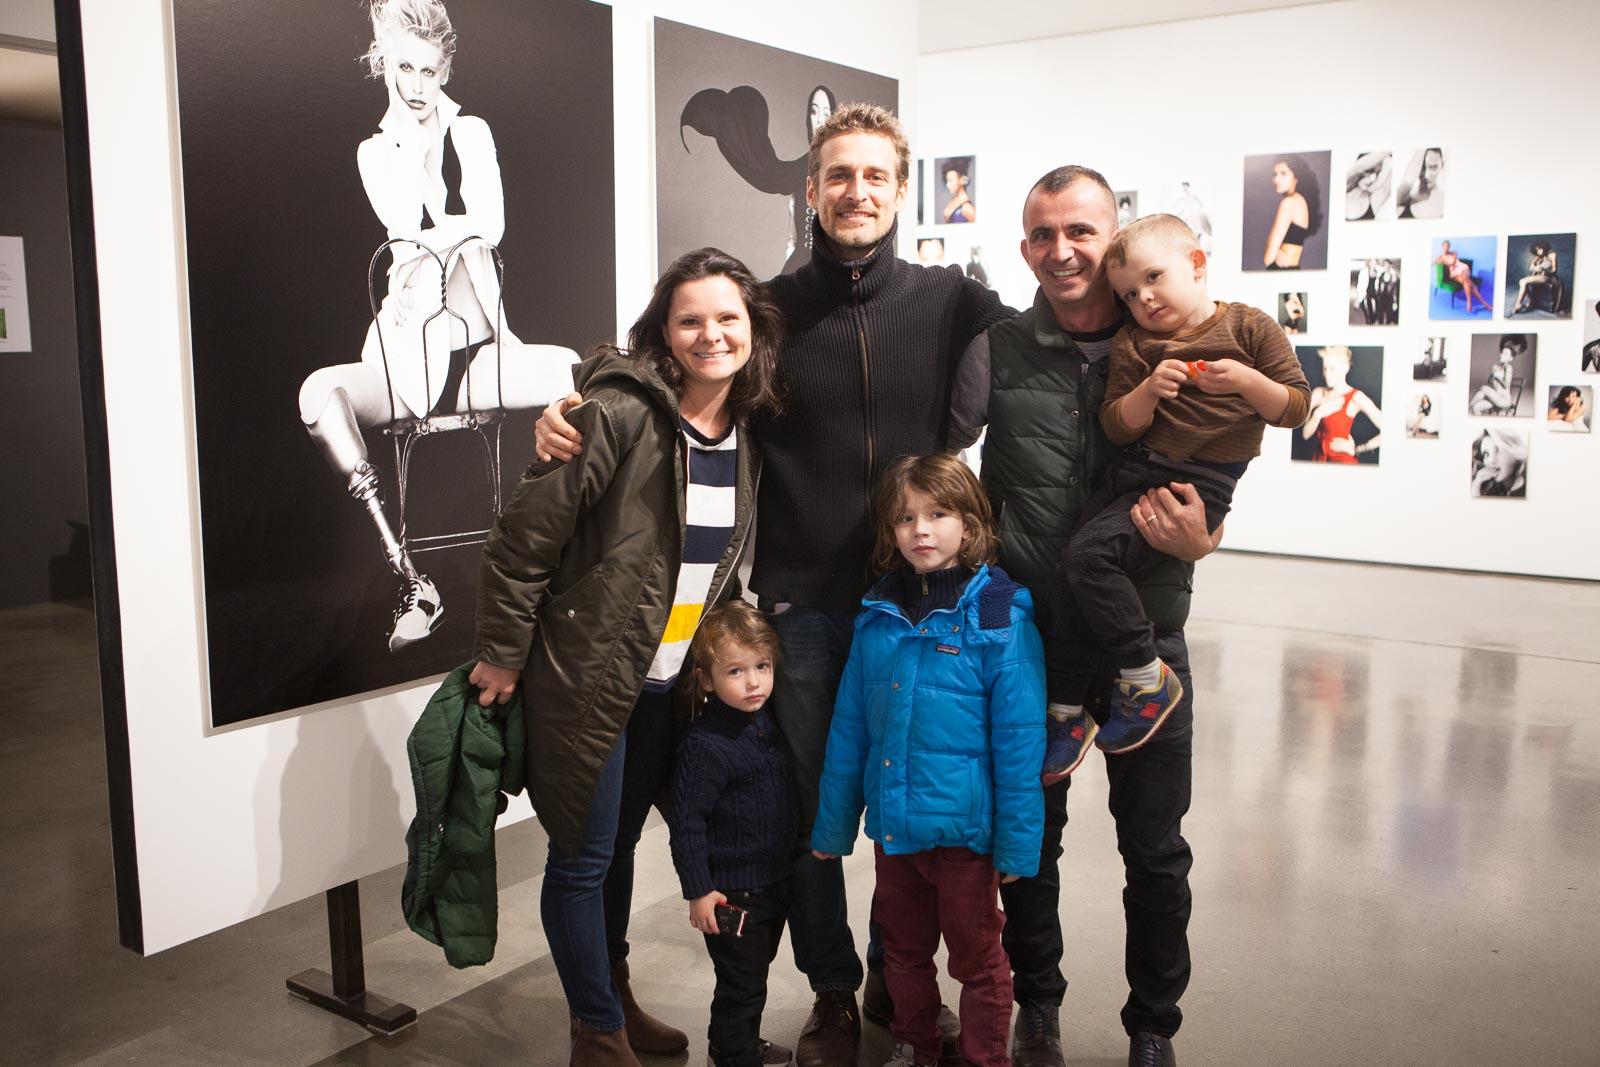 alexi-lubomirski-diverse-beauty-exhibition-robertiaga-17